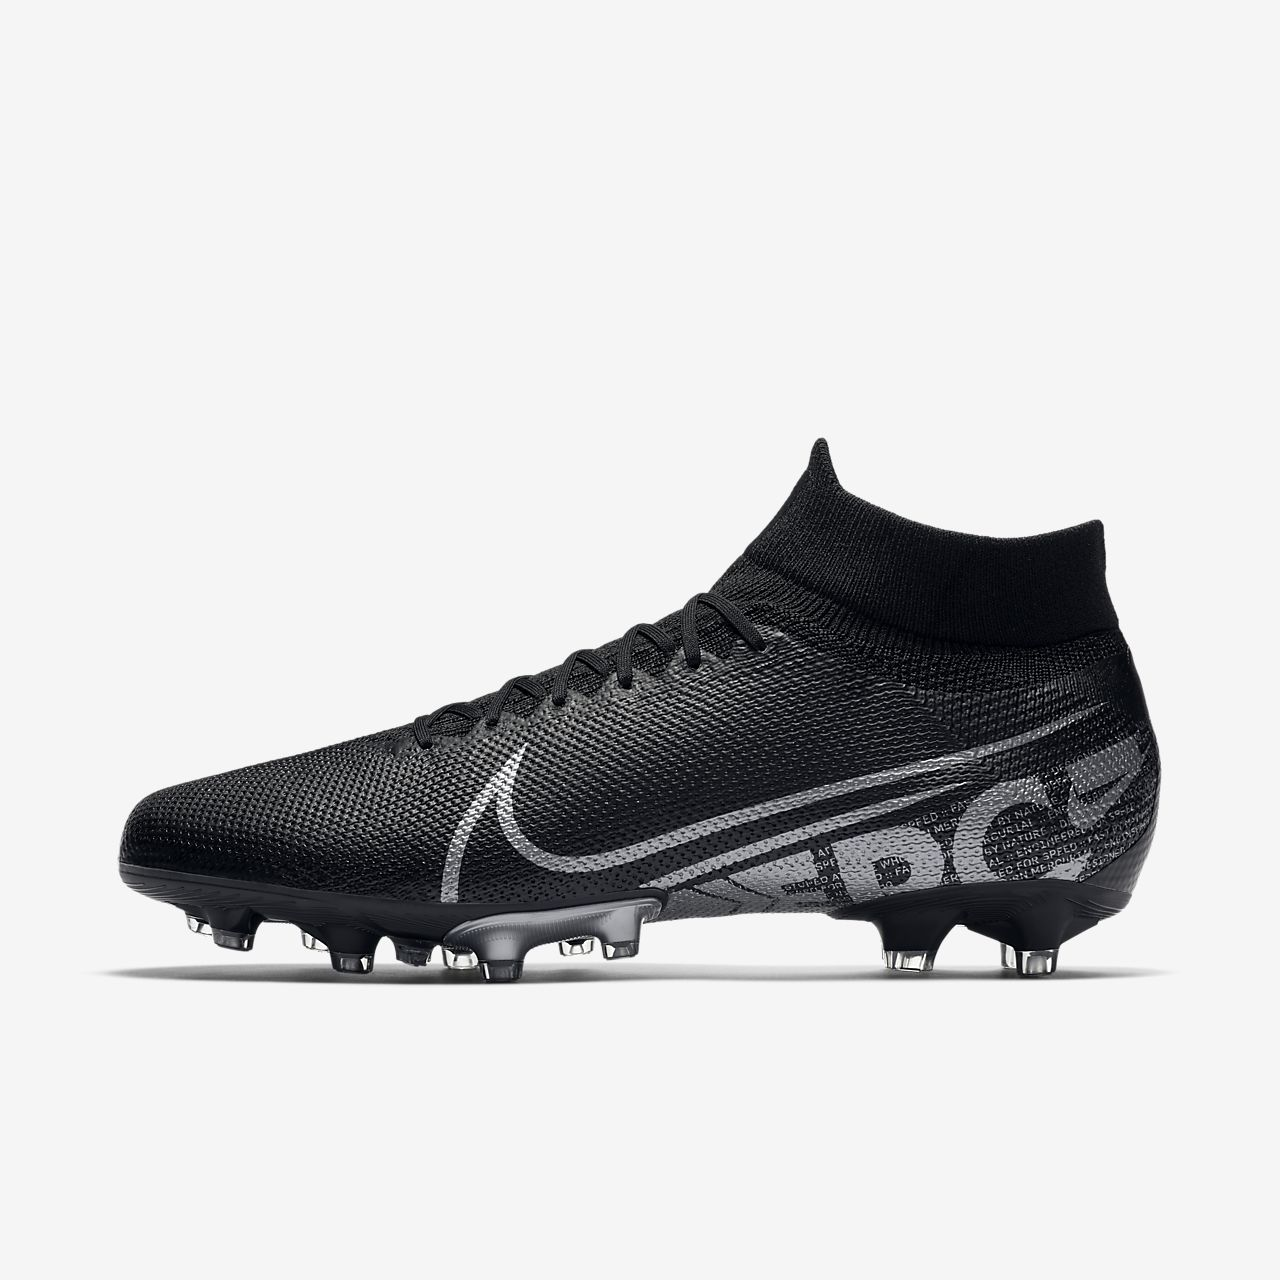 Nike Mercurial Superfly 7 Pro AG-PRO Botas de fútbol para césped artificial